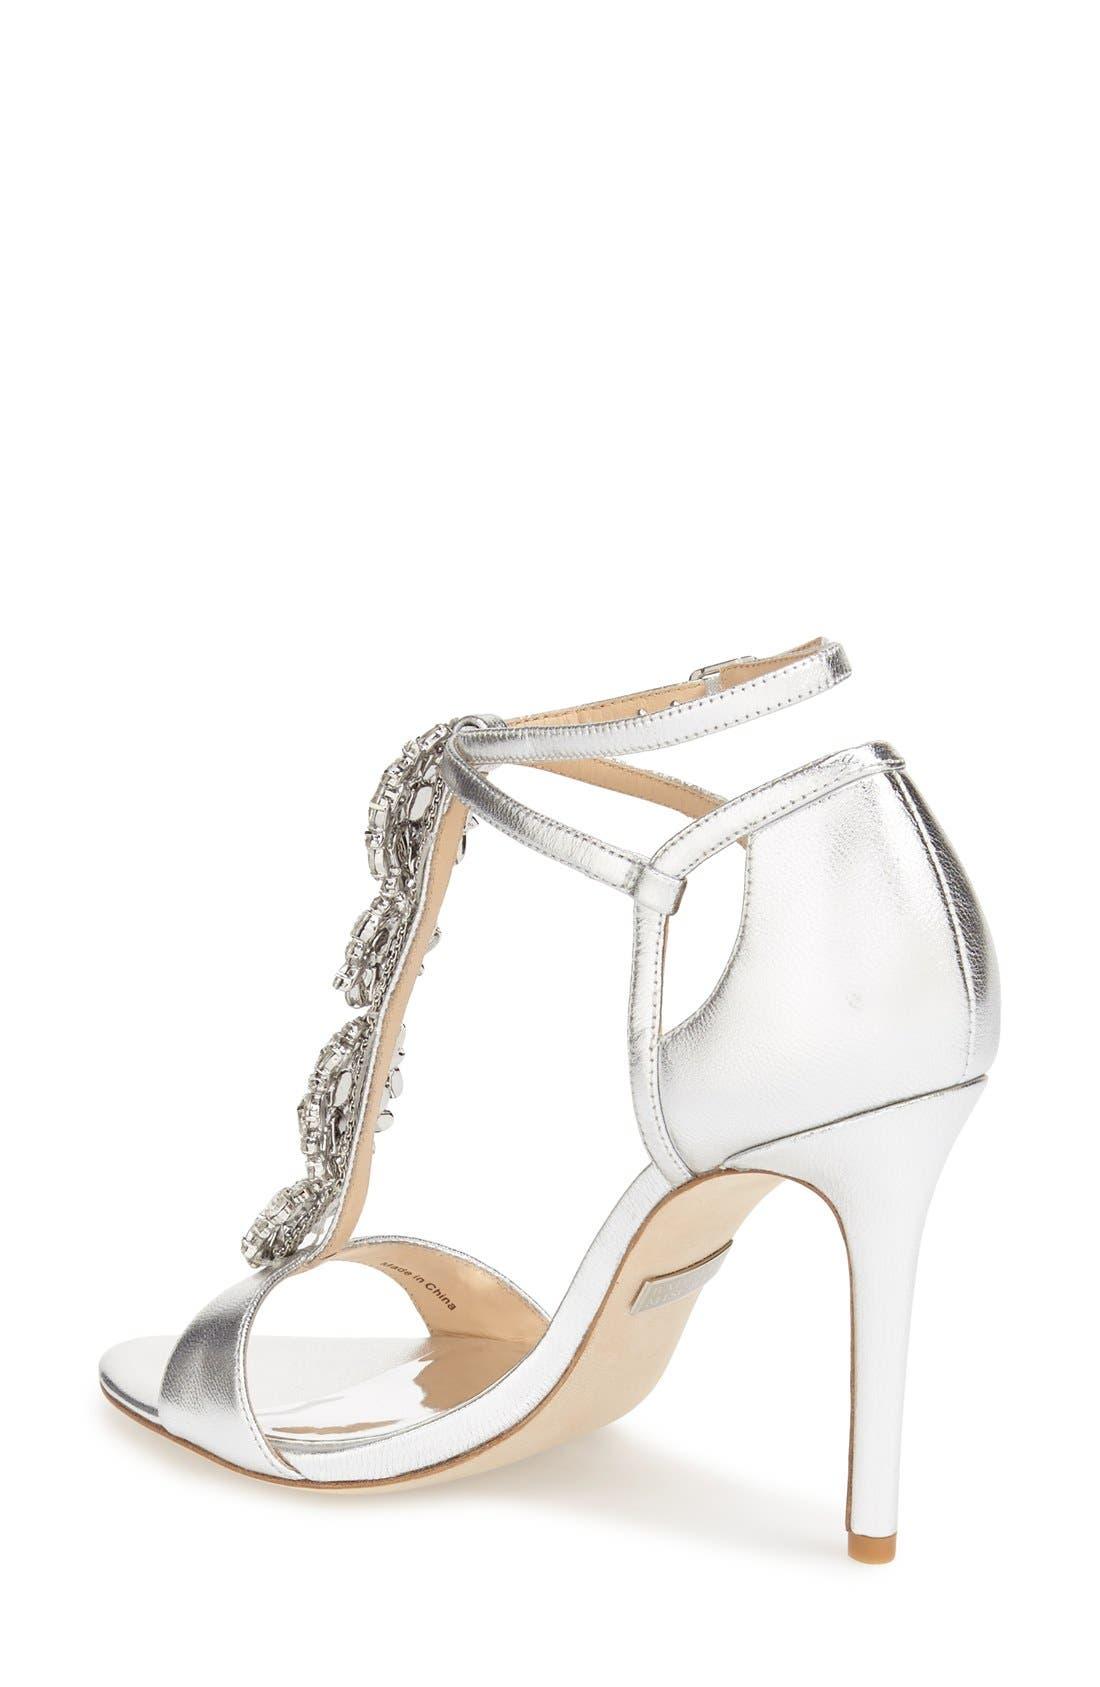 Alternate Image 2  - Badgley Mischka 'Leigh' Embellished Evening Sandal (Women)